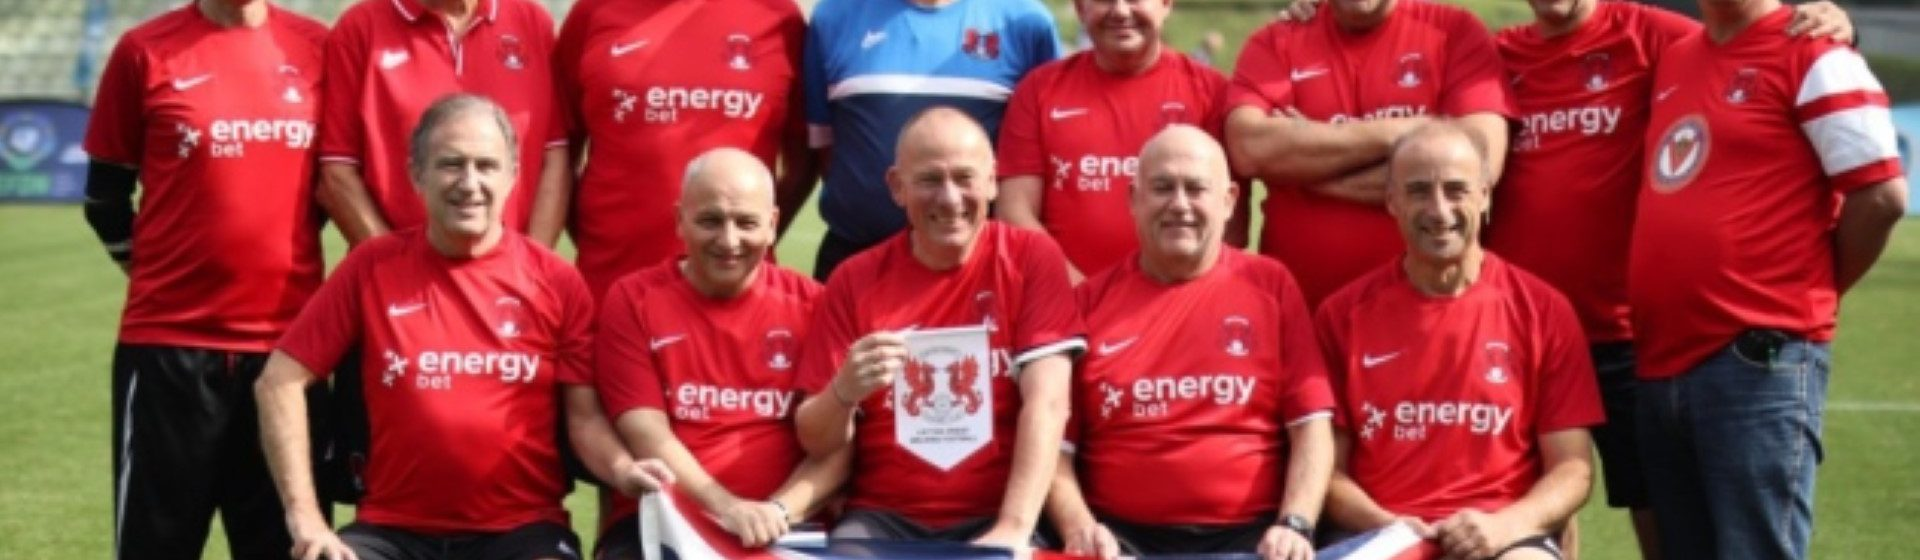 Leyton Orient Walking Football Club header